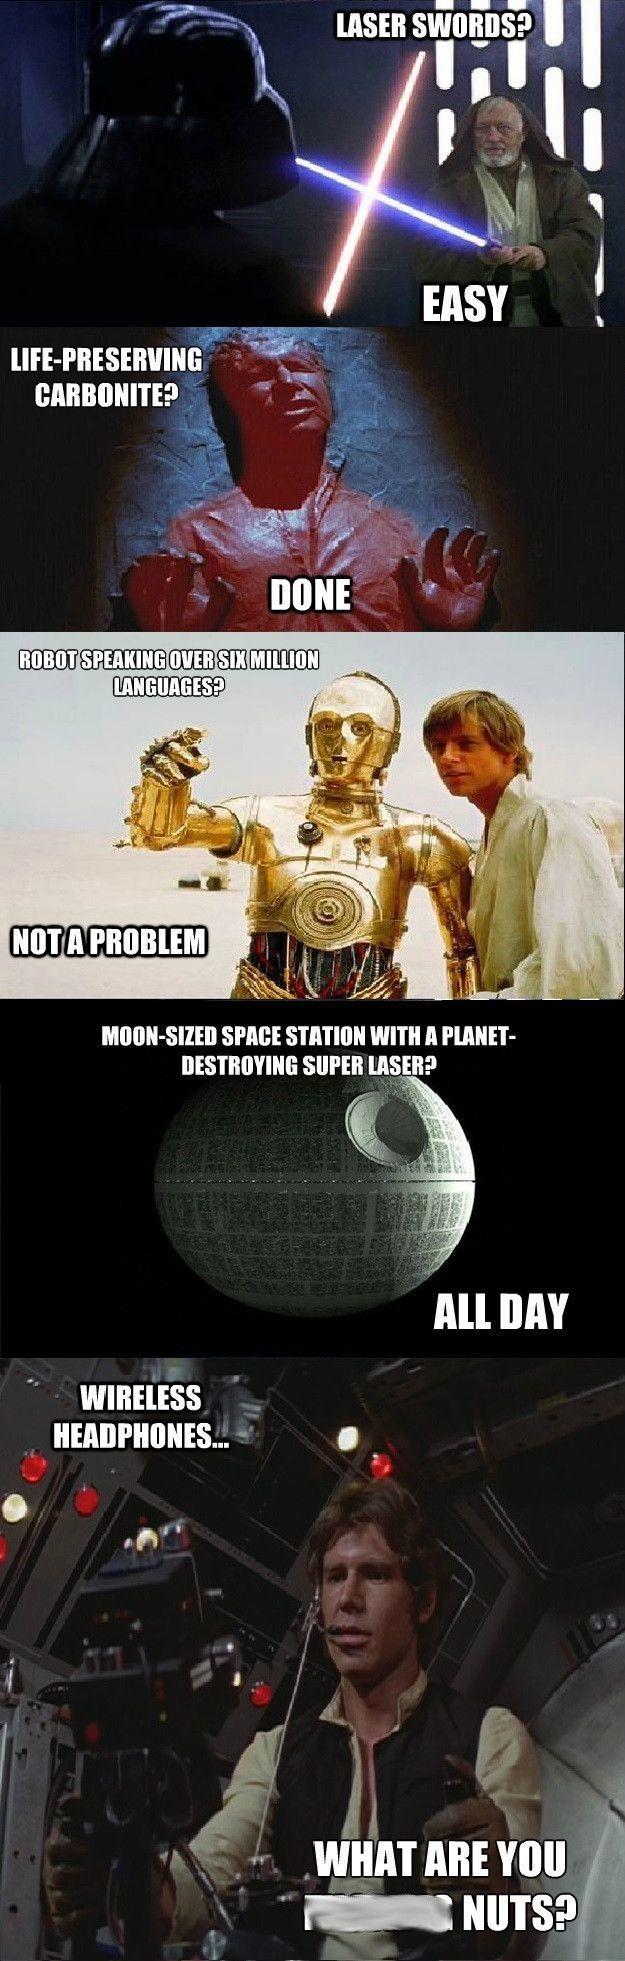 Star Wars Technology Star Wars Jokes Star Wars Memes Star Wars Humor